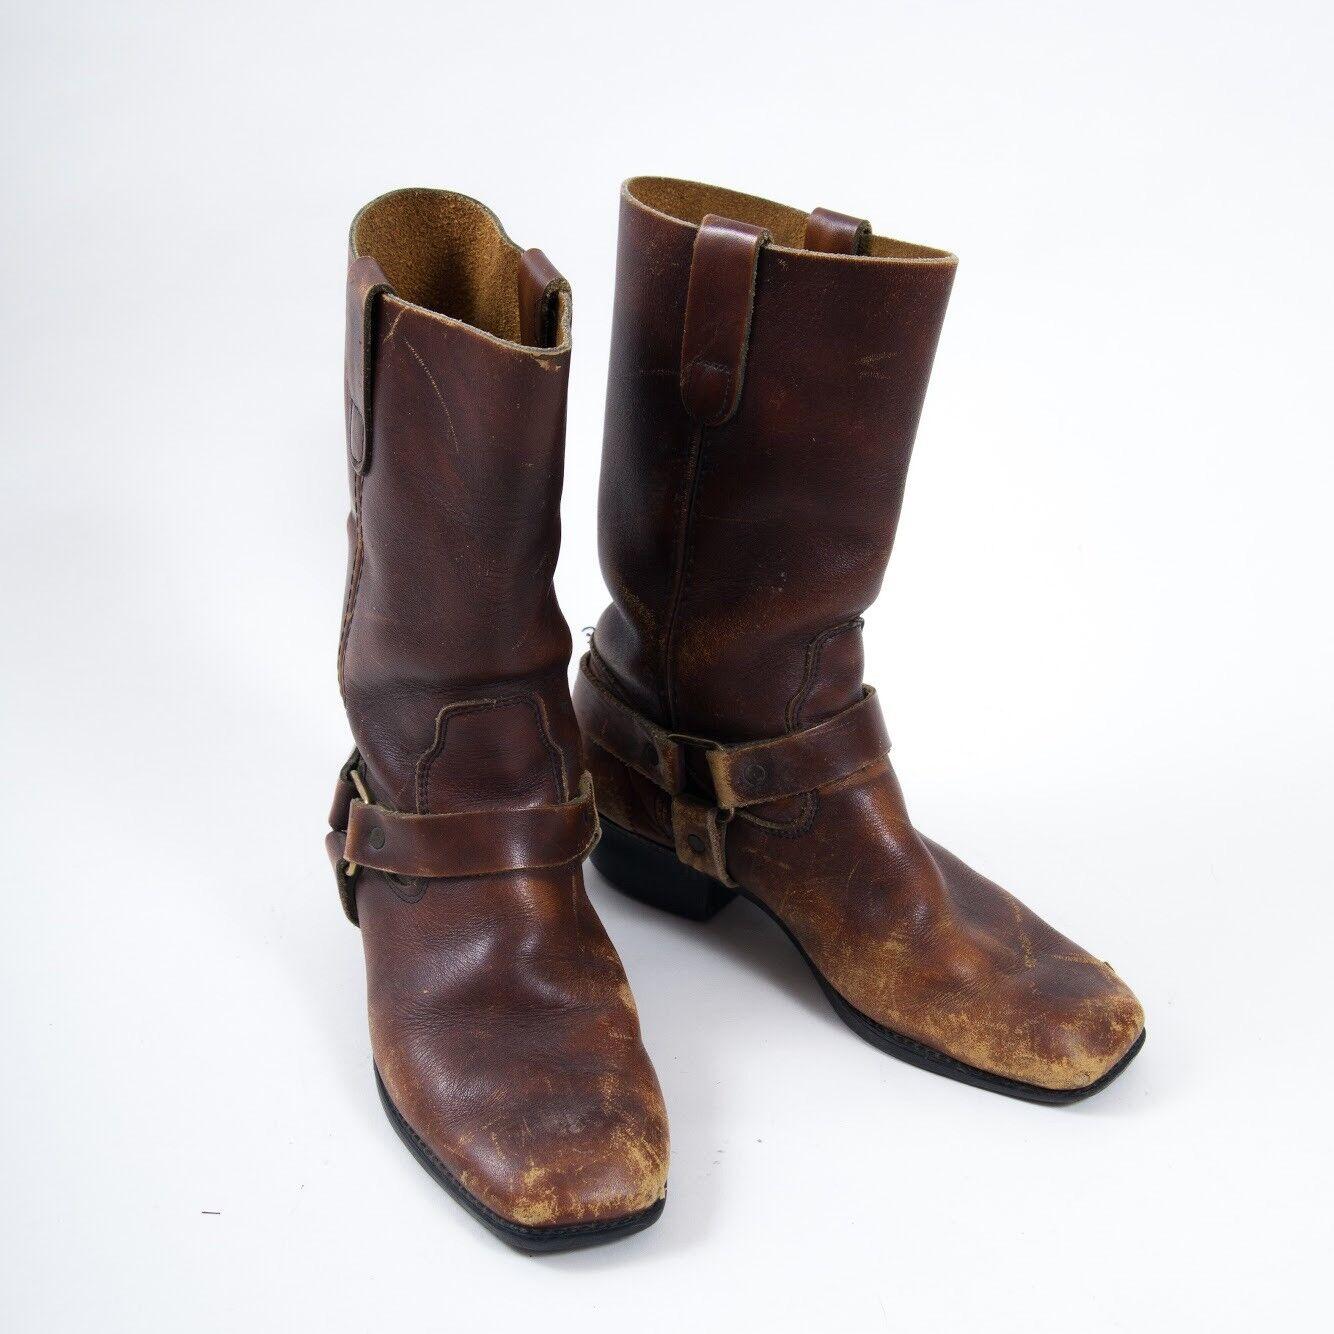 "Vtg Biker Boots Leather Half Calf Square Toe Brown 1.5"" Heel women's 7.5"